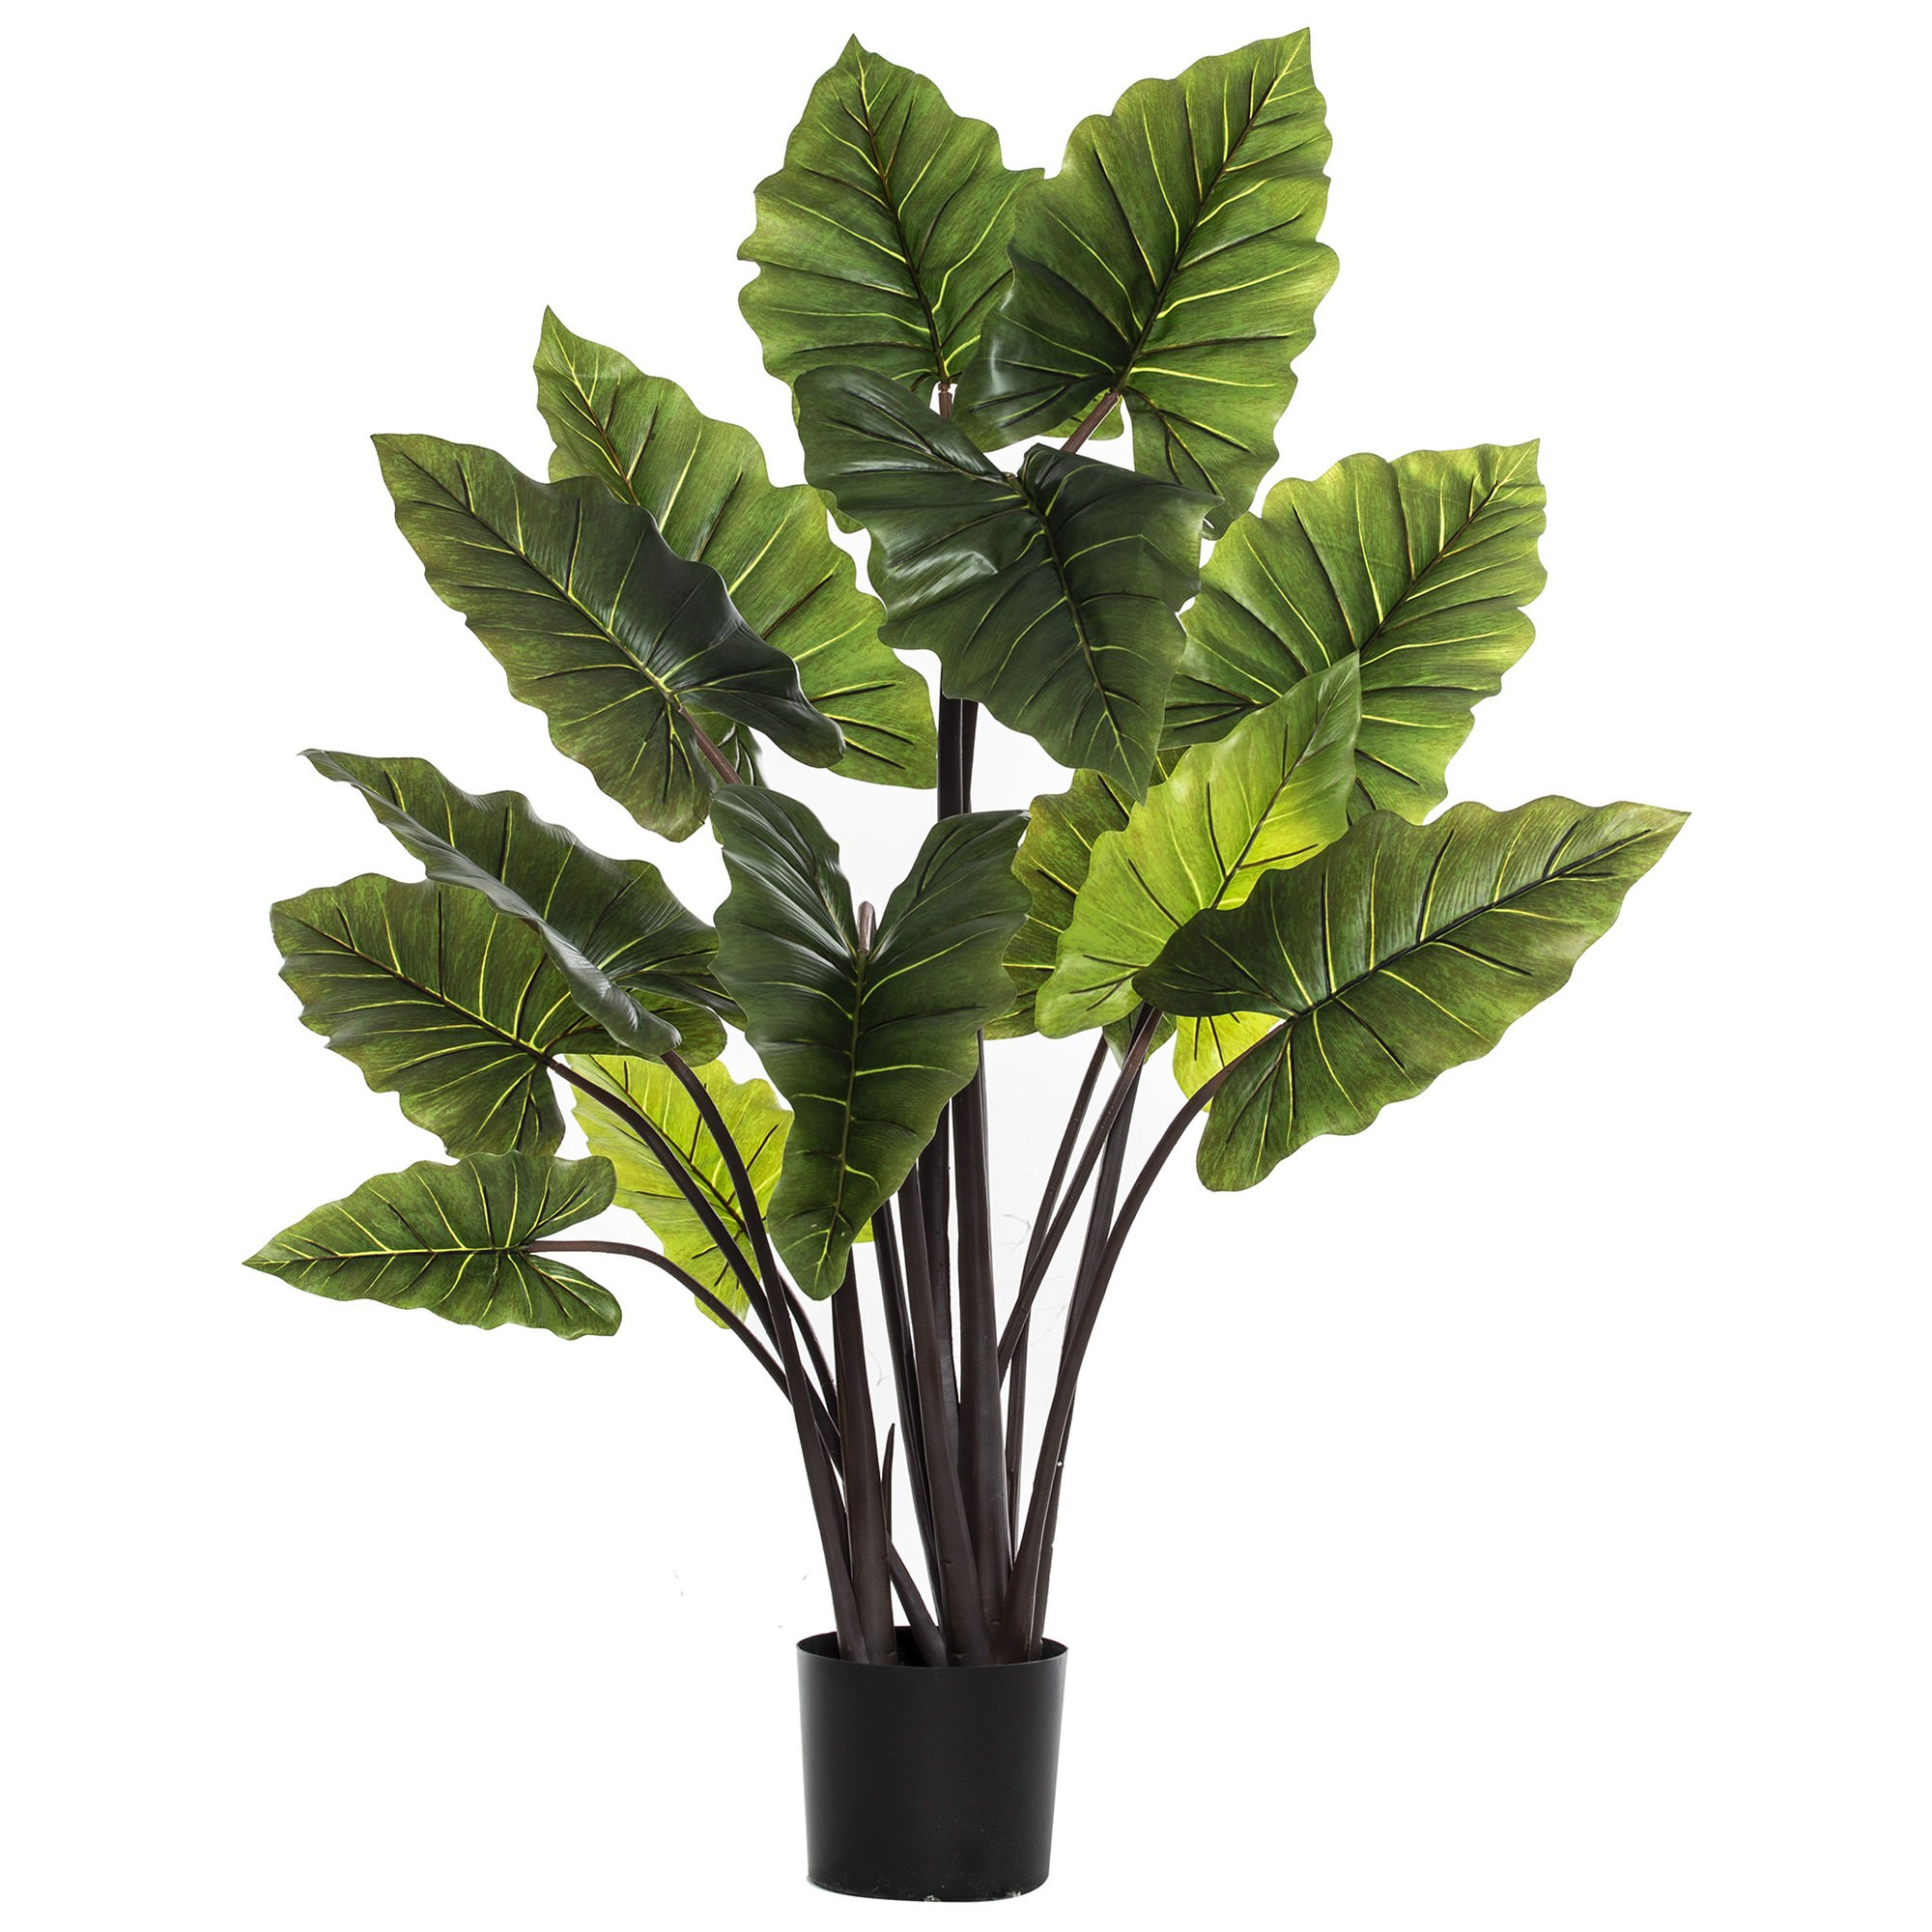 Potted Artificial Alocasia Plant, 140cm